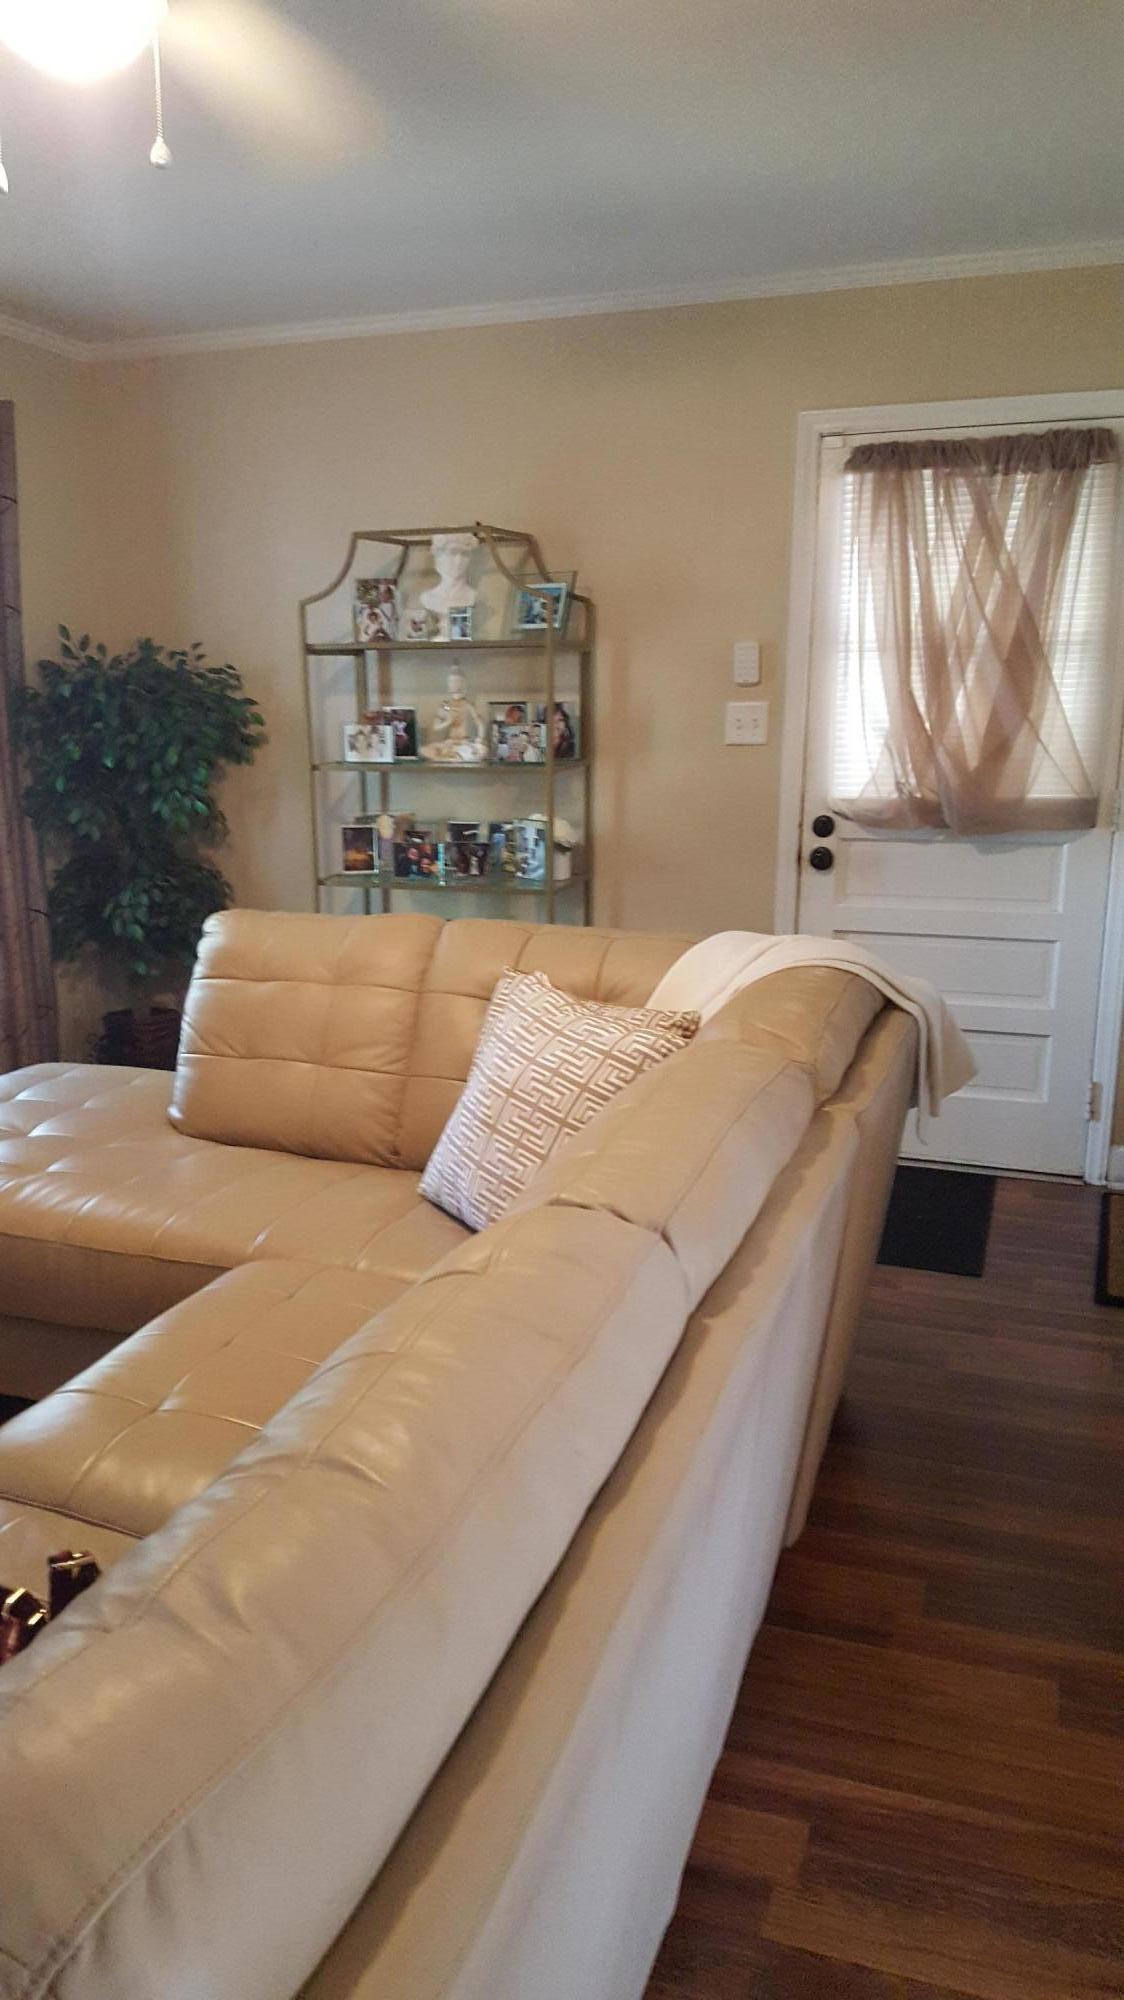 Pepperhill Homes For Sale - 7640 Hillandale, North Charleston, SC - 17